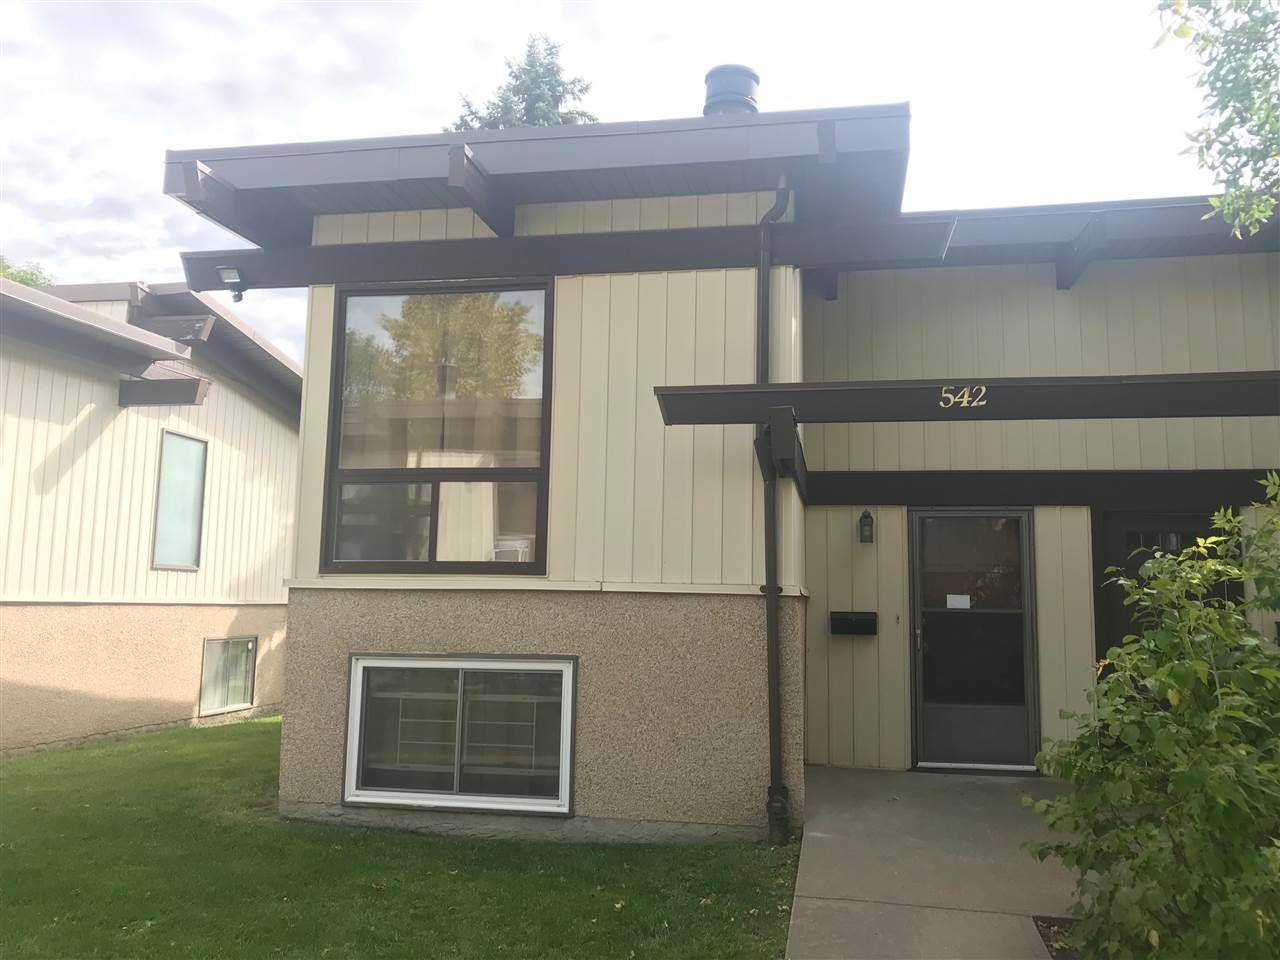 Townhouse for sale at 542 Lee_ridge Rd Nw Edmonton Alberta - MLS: E4184524